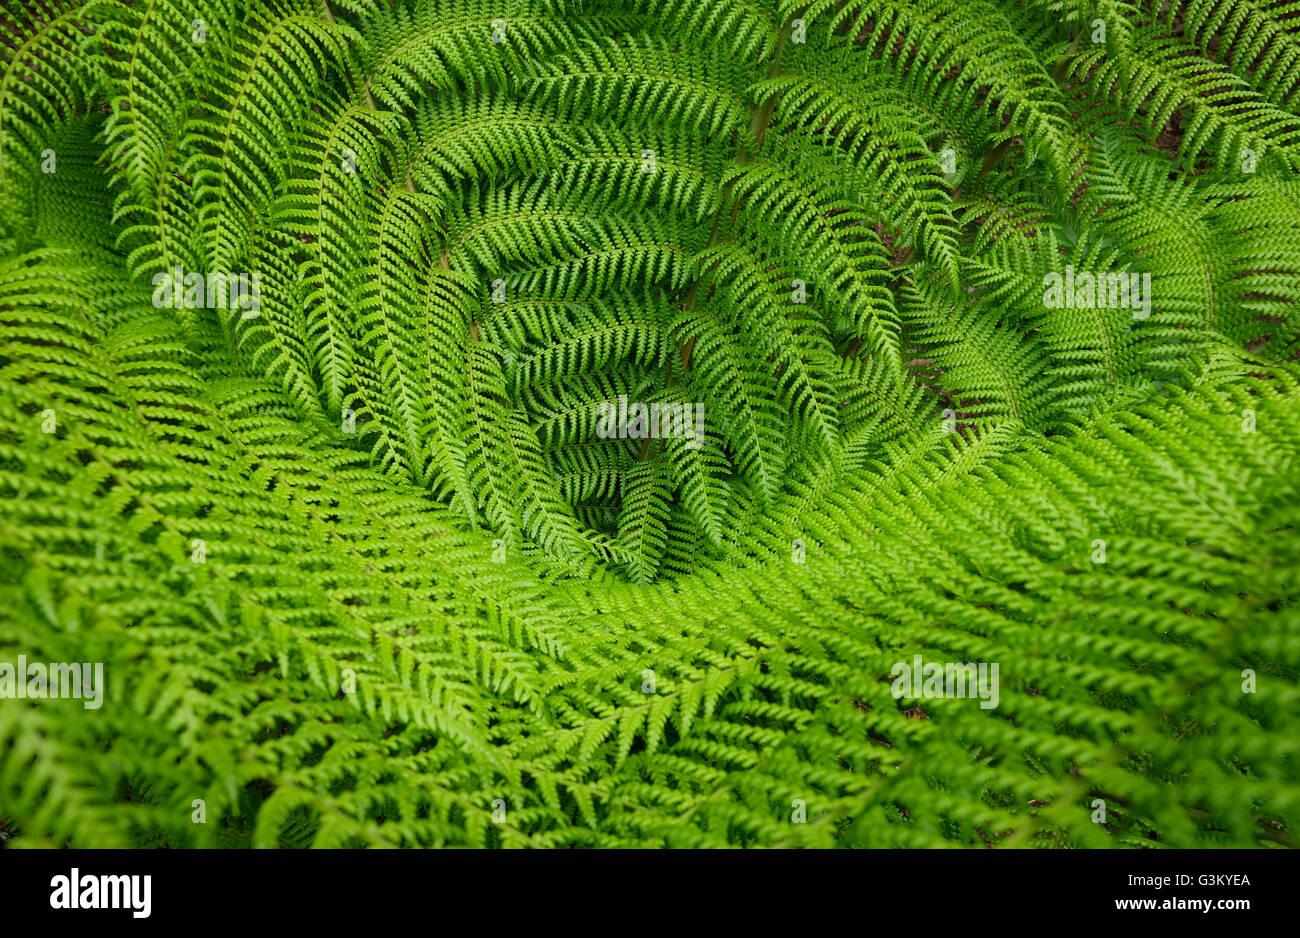 tree fern green leaves - Stock Image